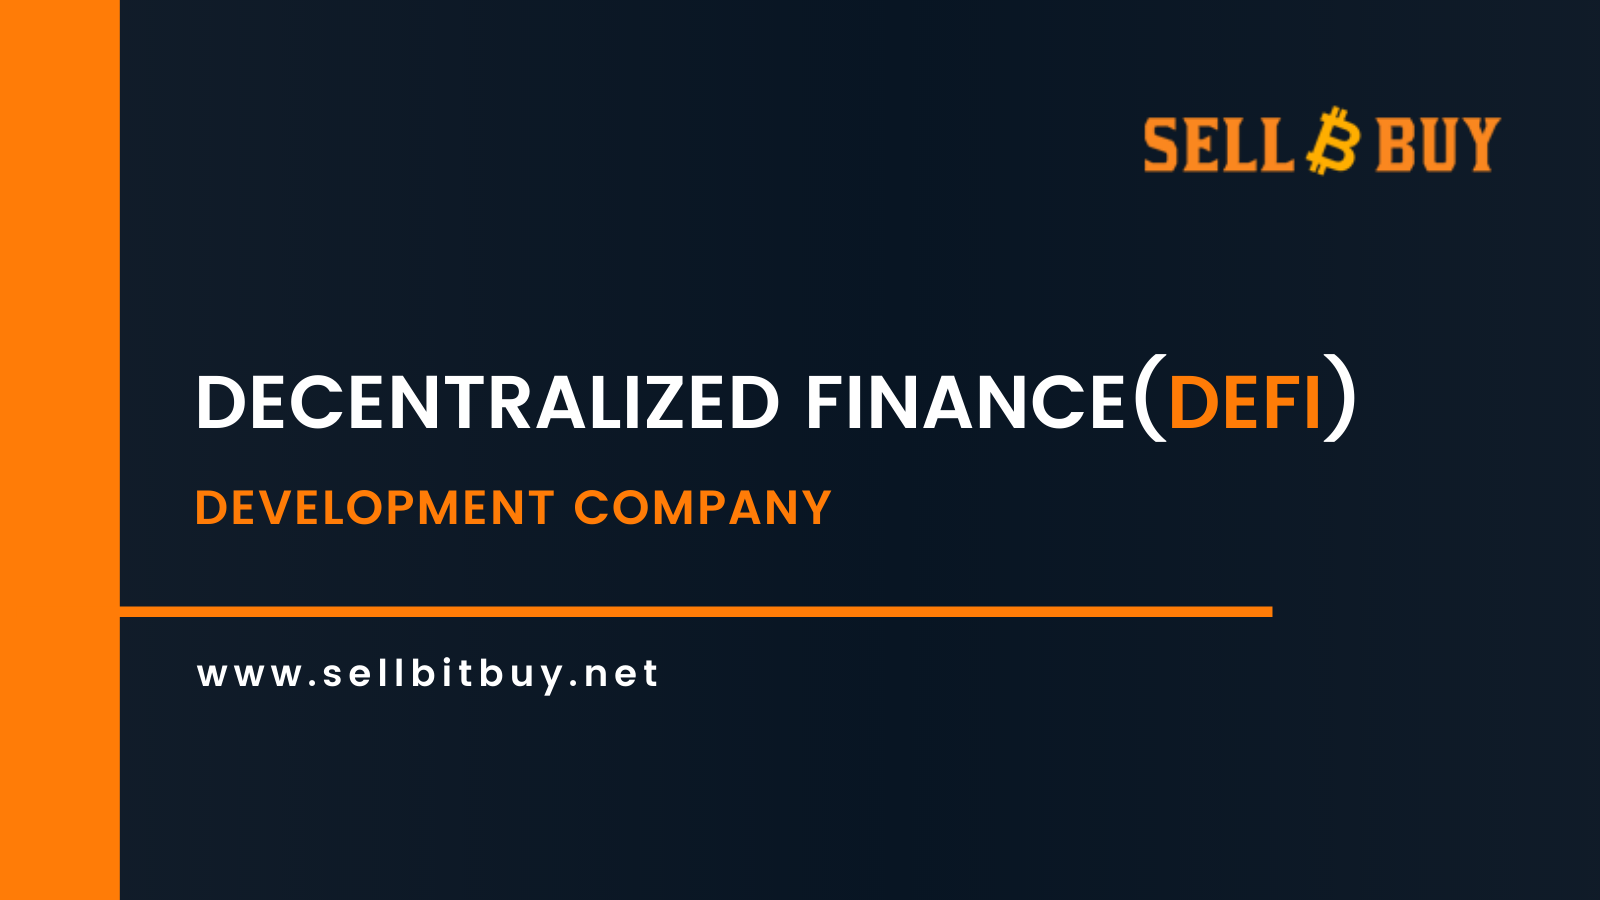 Decentralized Finance (DeFi) Development Company